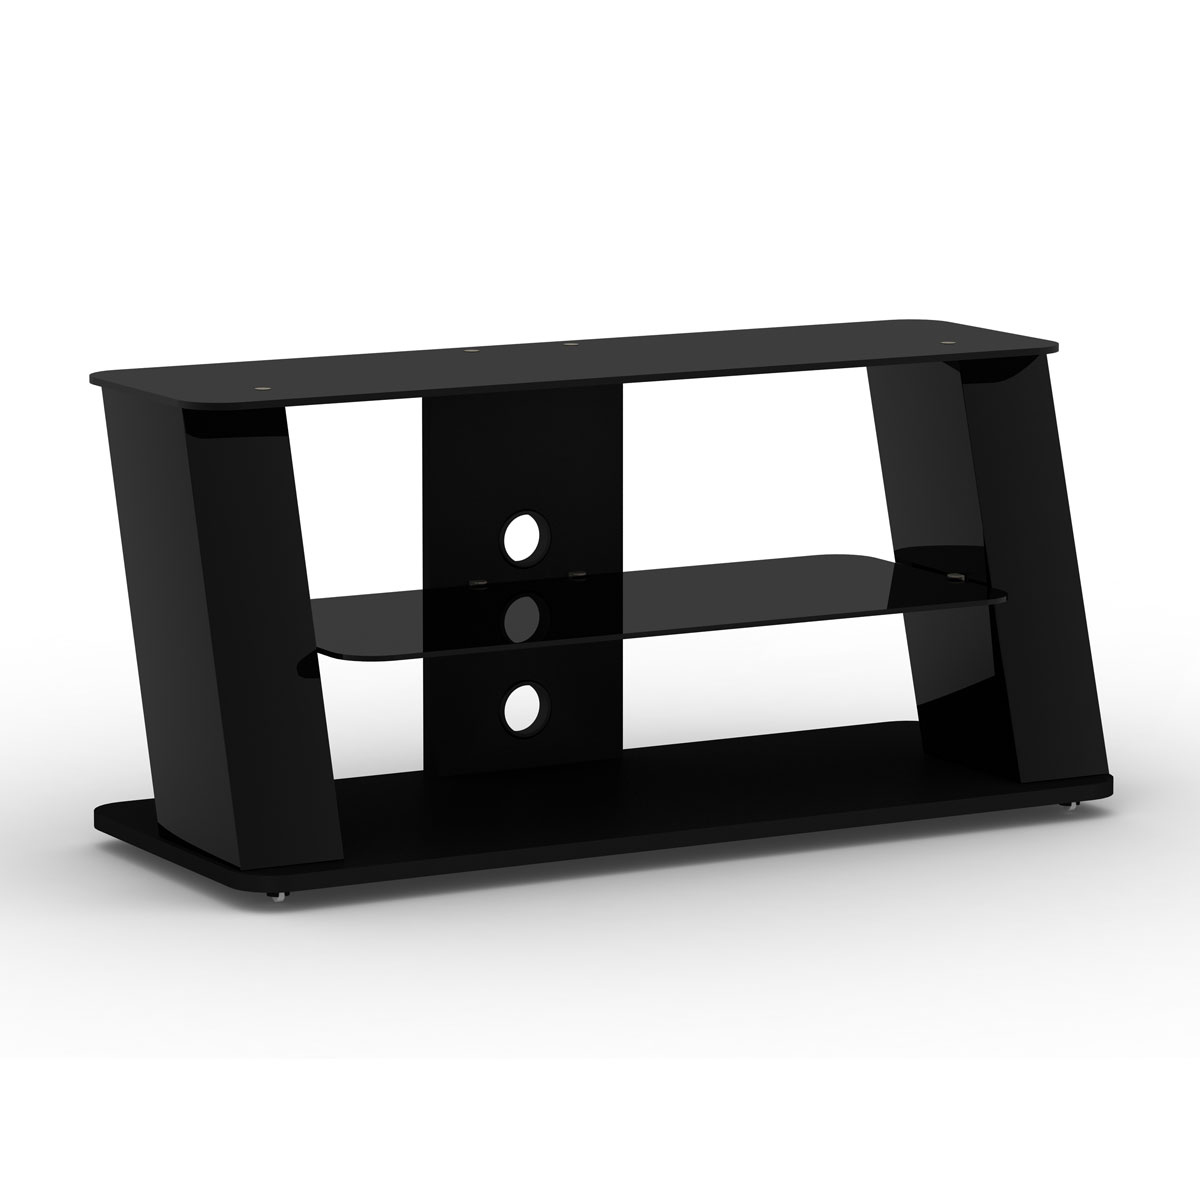 Elmob alexa al 110 04 noir al 110 04 black achat - Meuble tv pour ecran plat ...